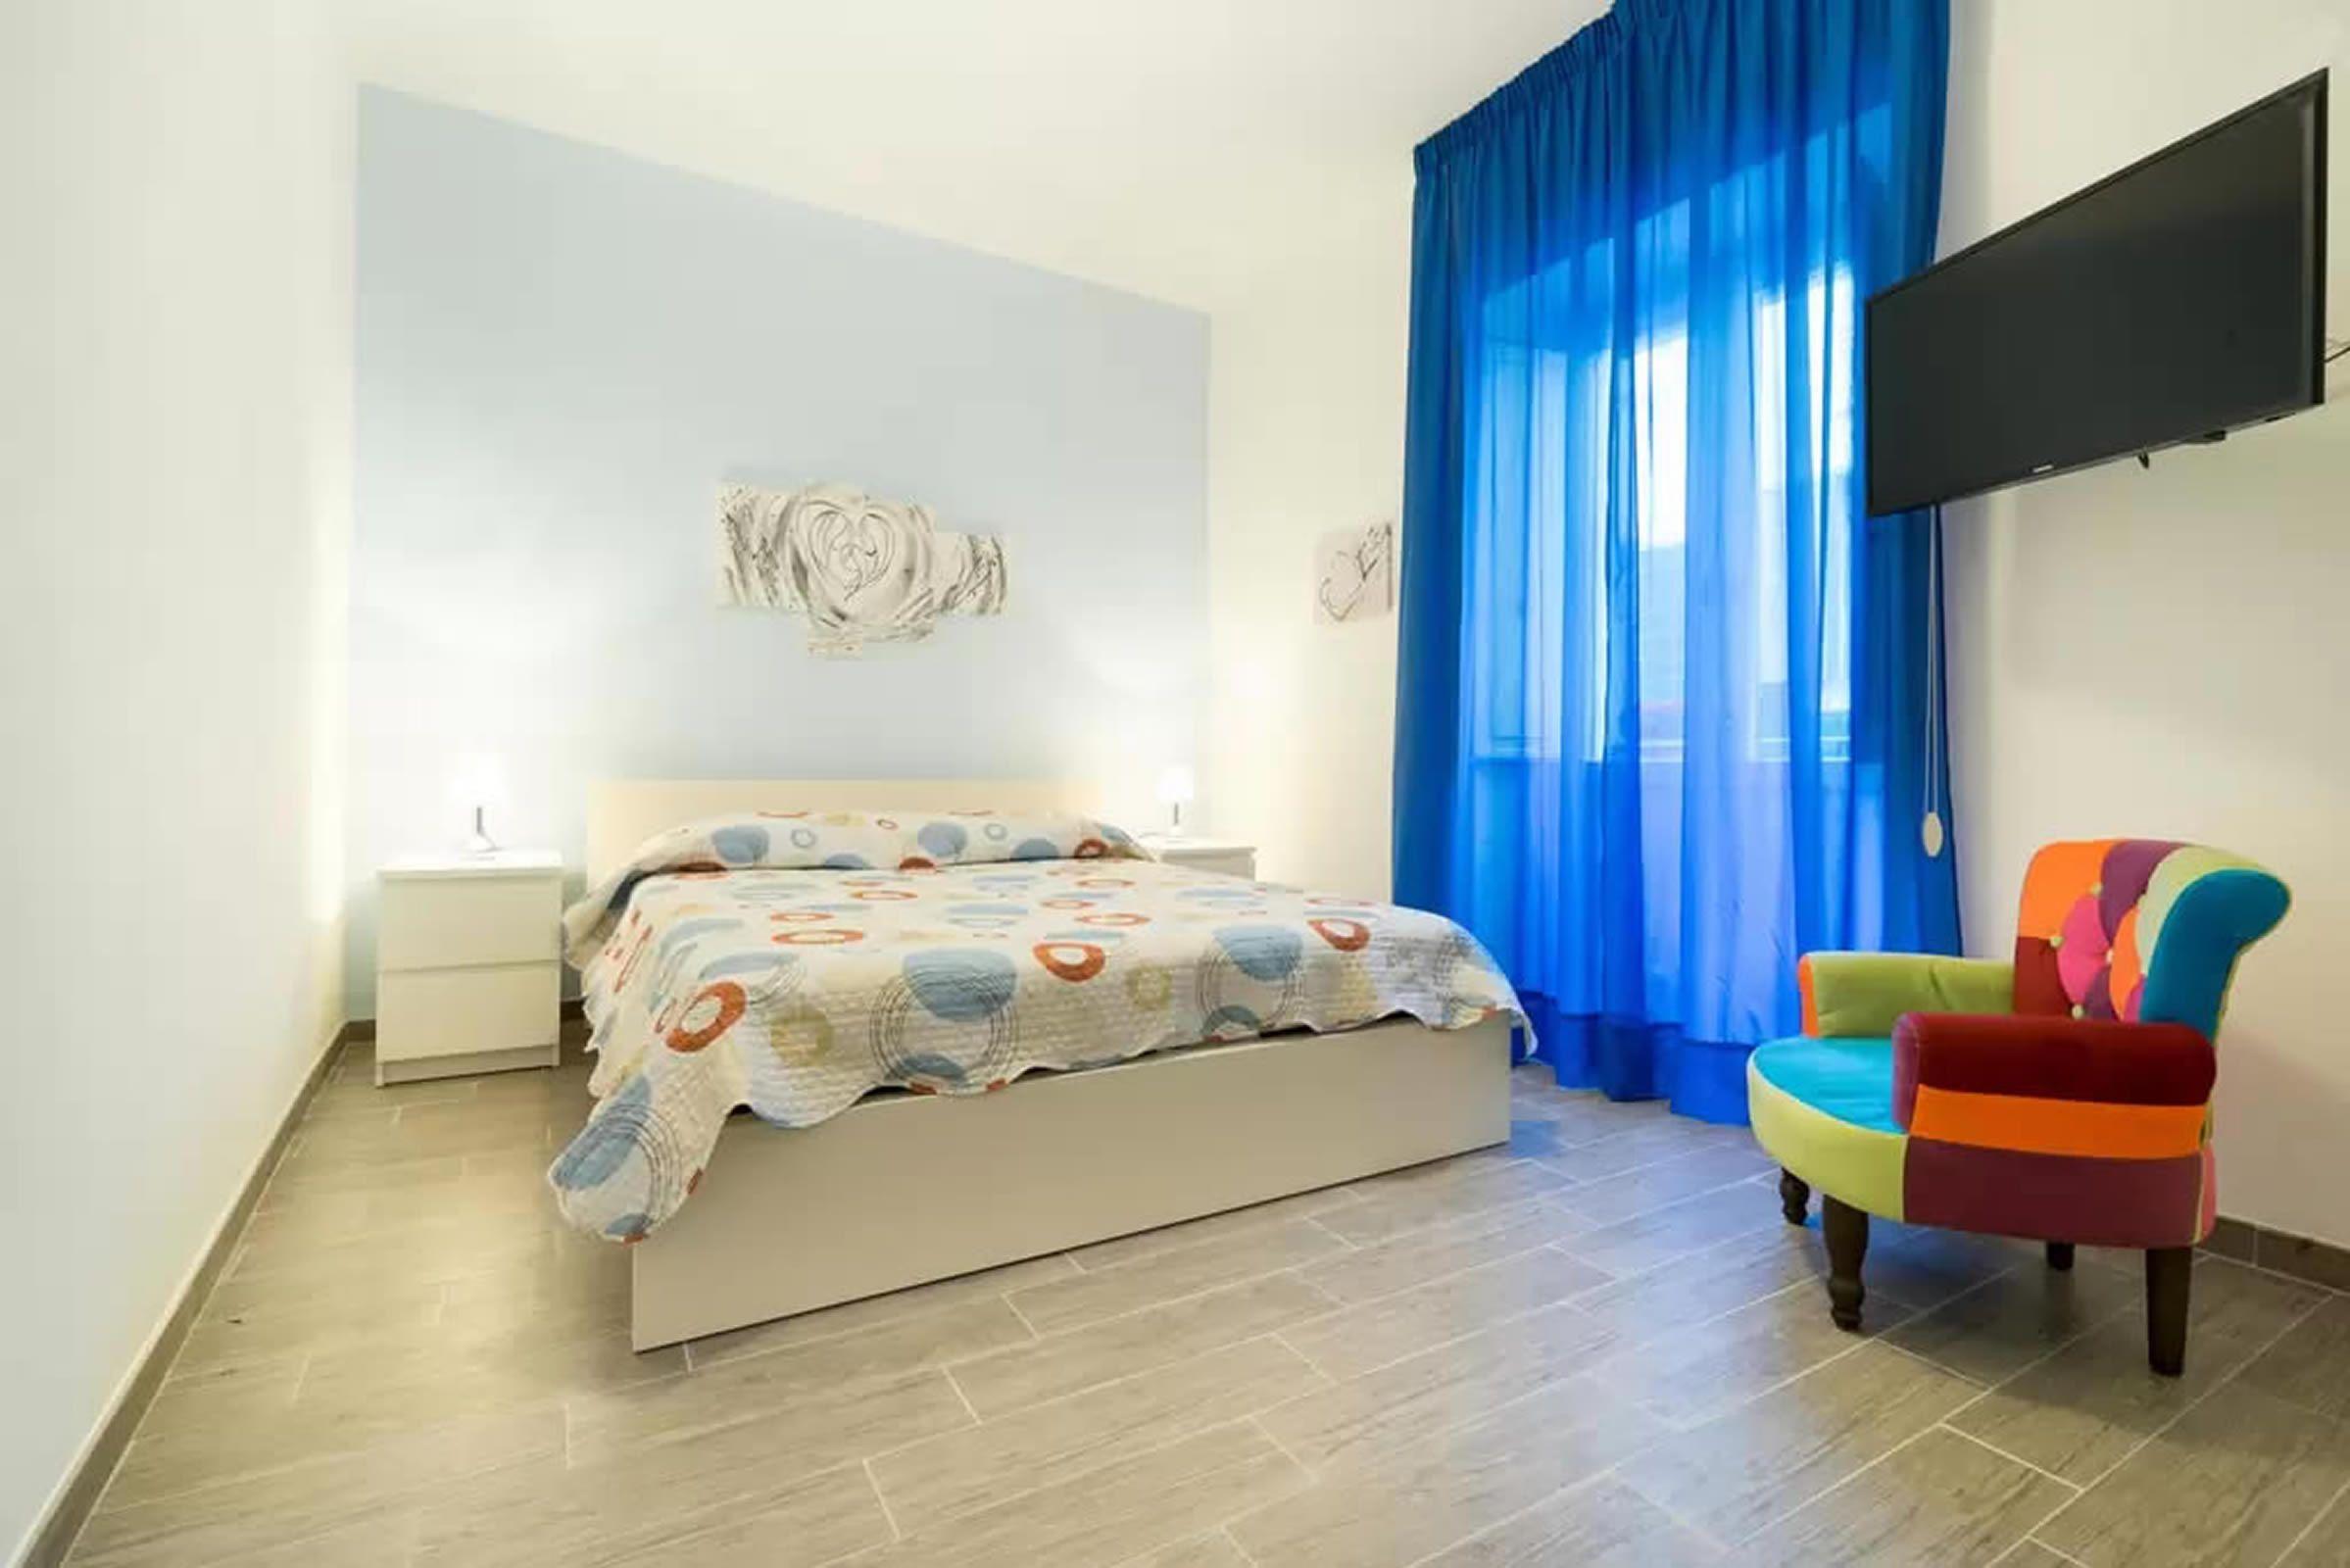 Pin di Talia Ortigia su Talia Ortigia Apartment